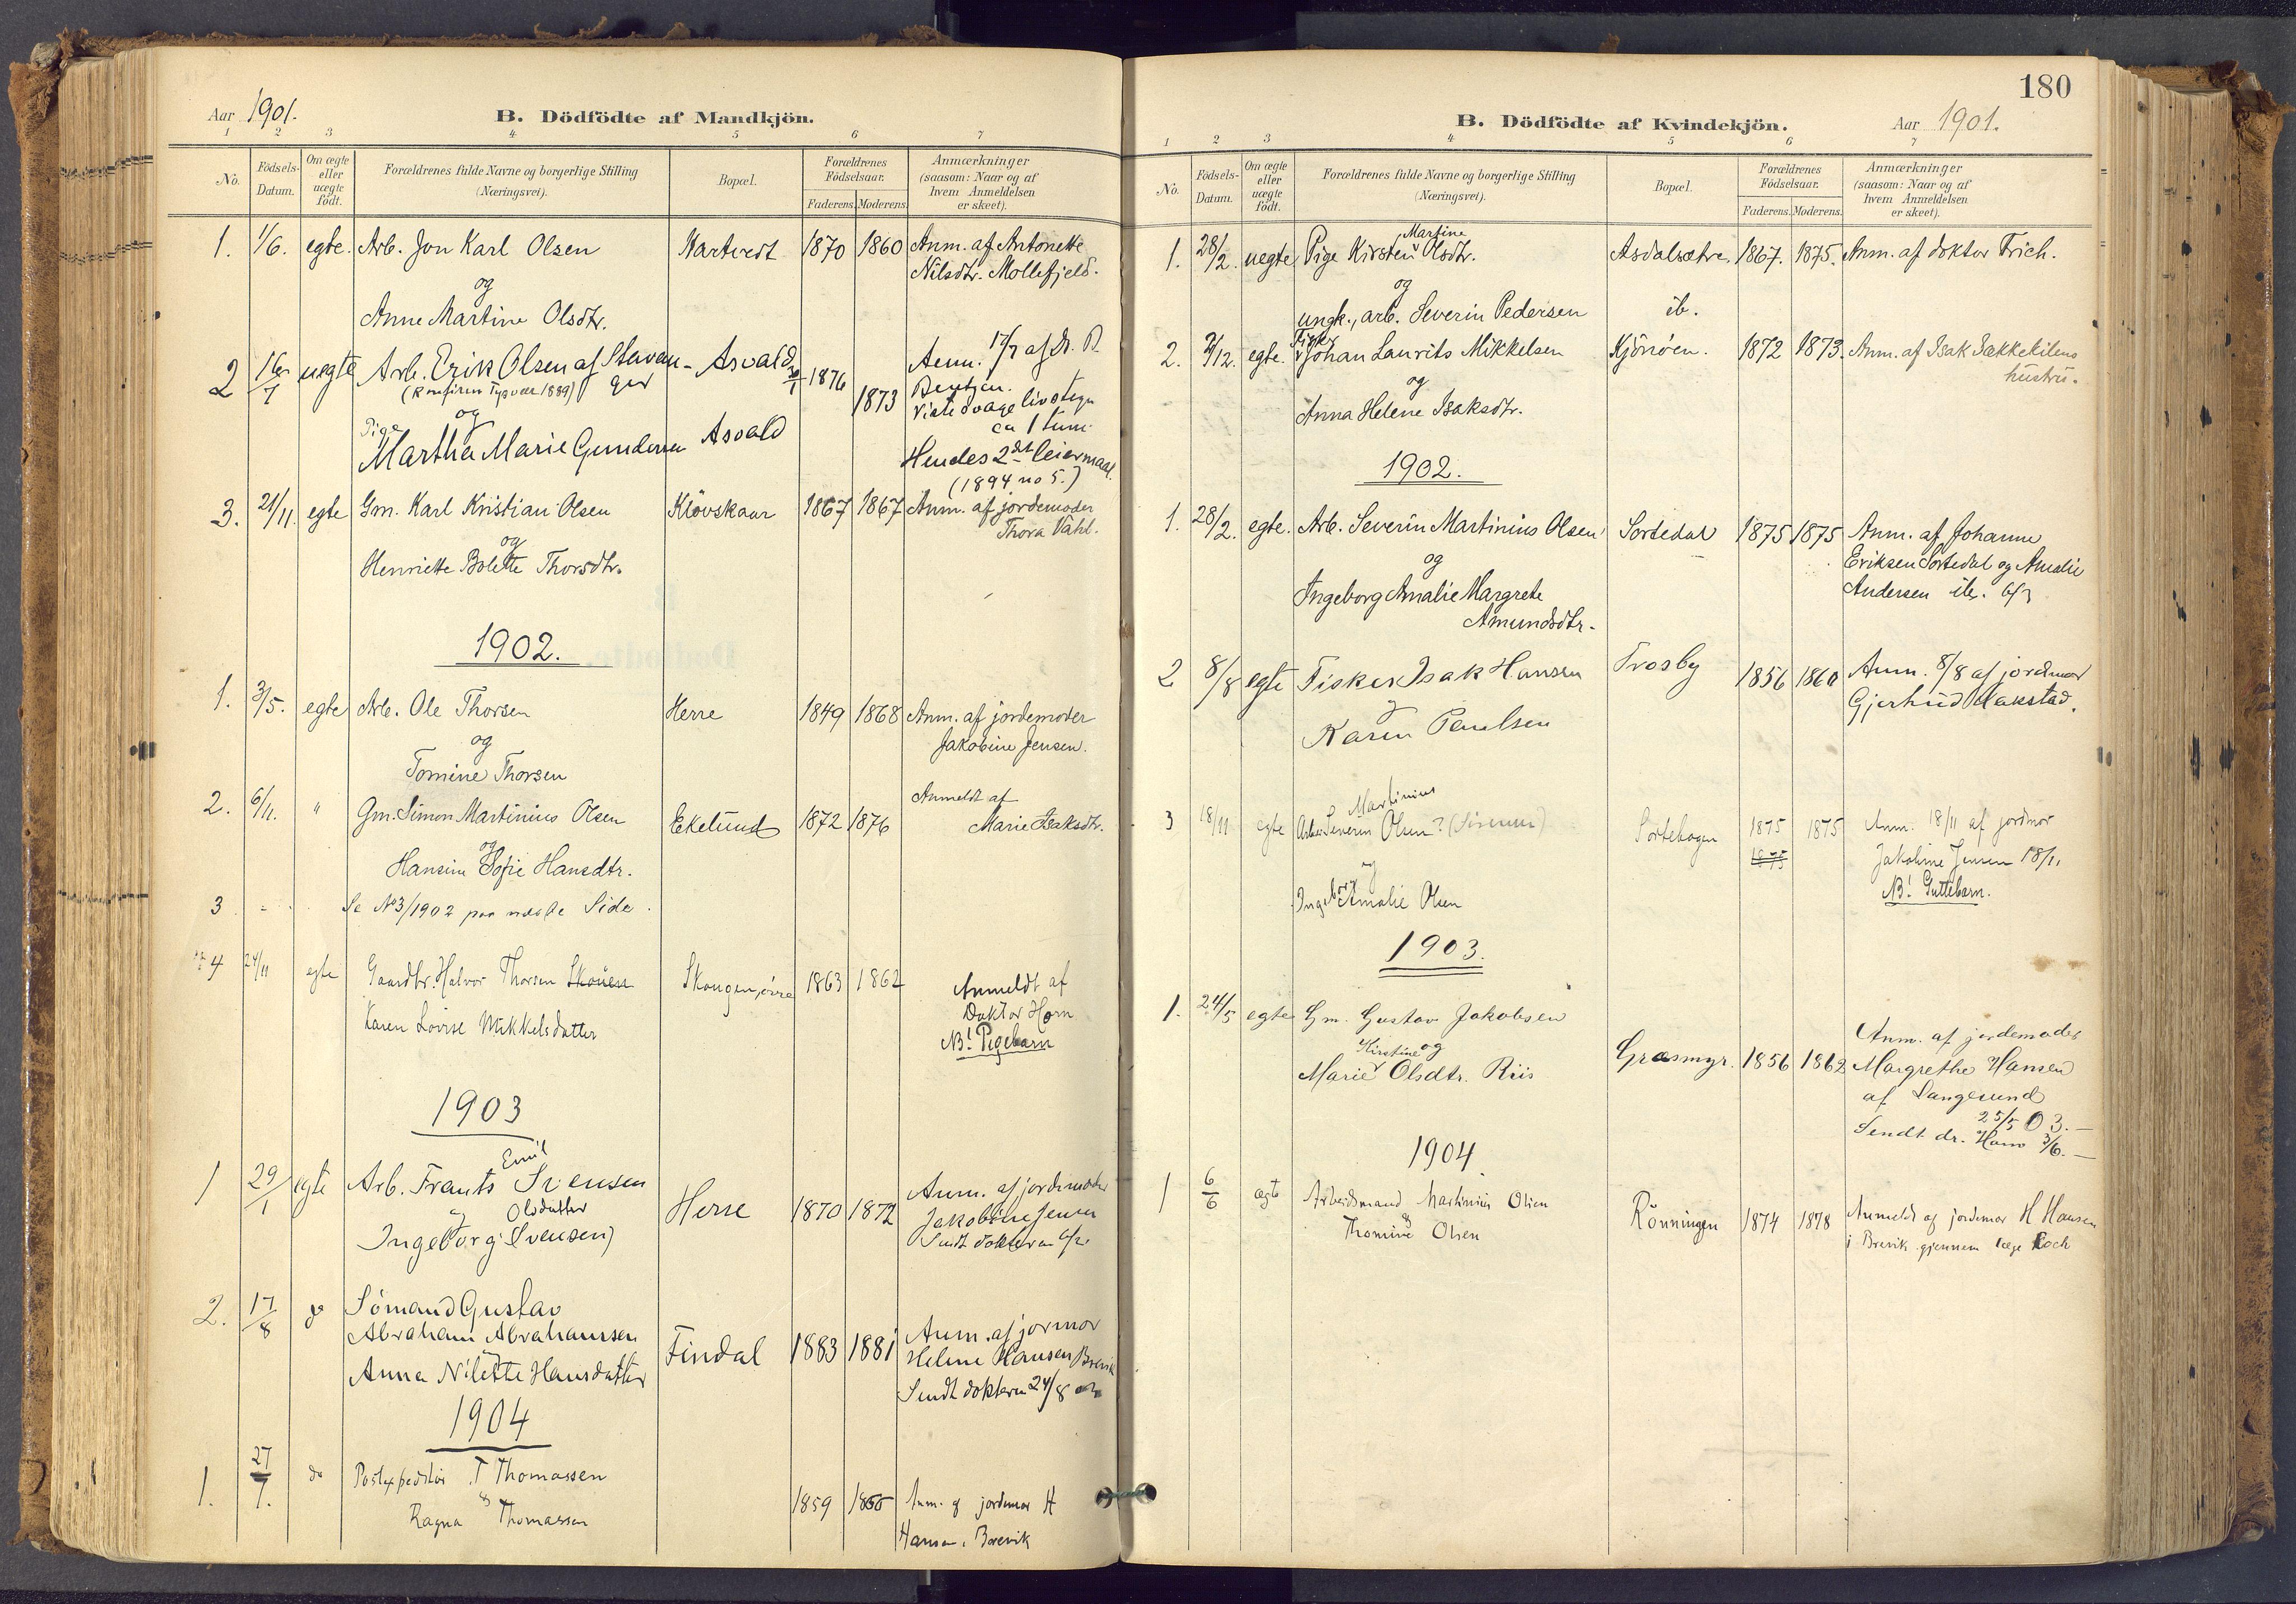 SAKO, Bamble kirkebøker, F/Fa/L0009: Ministerialbok nr. I 9, 1901-1917, s. 180